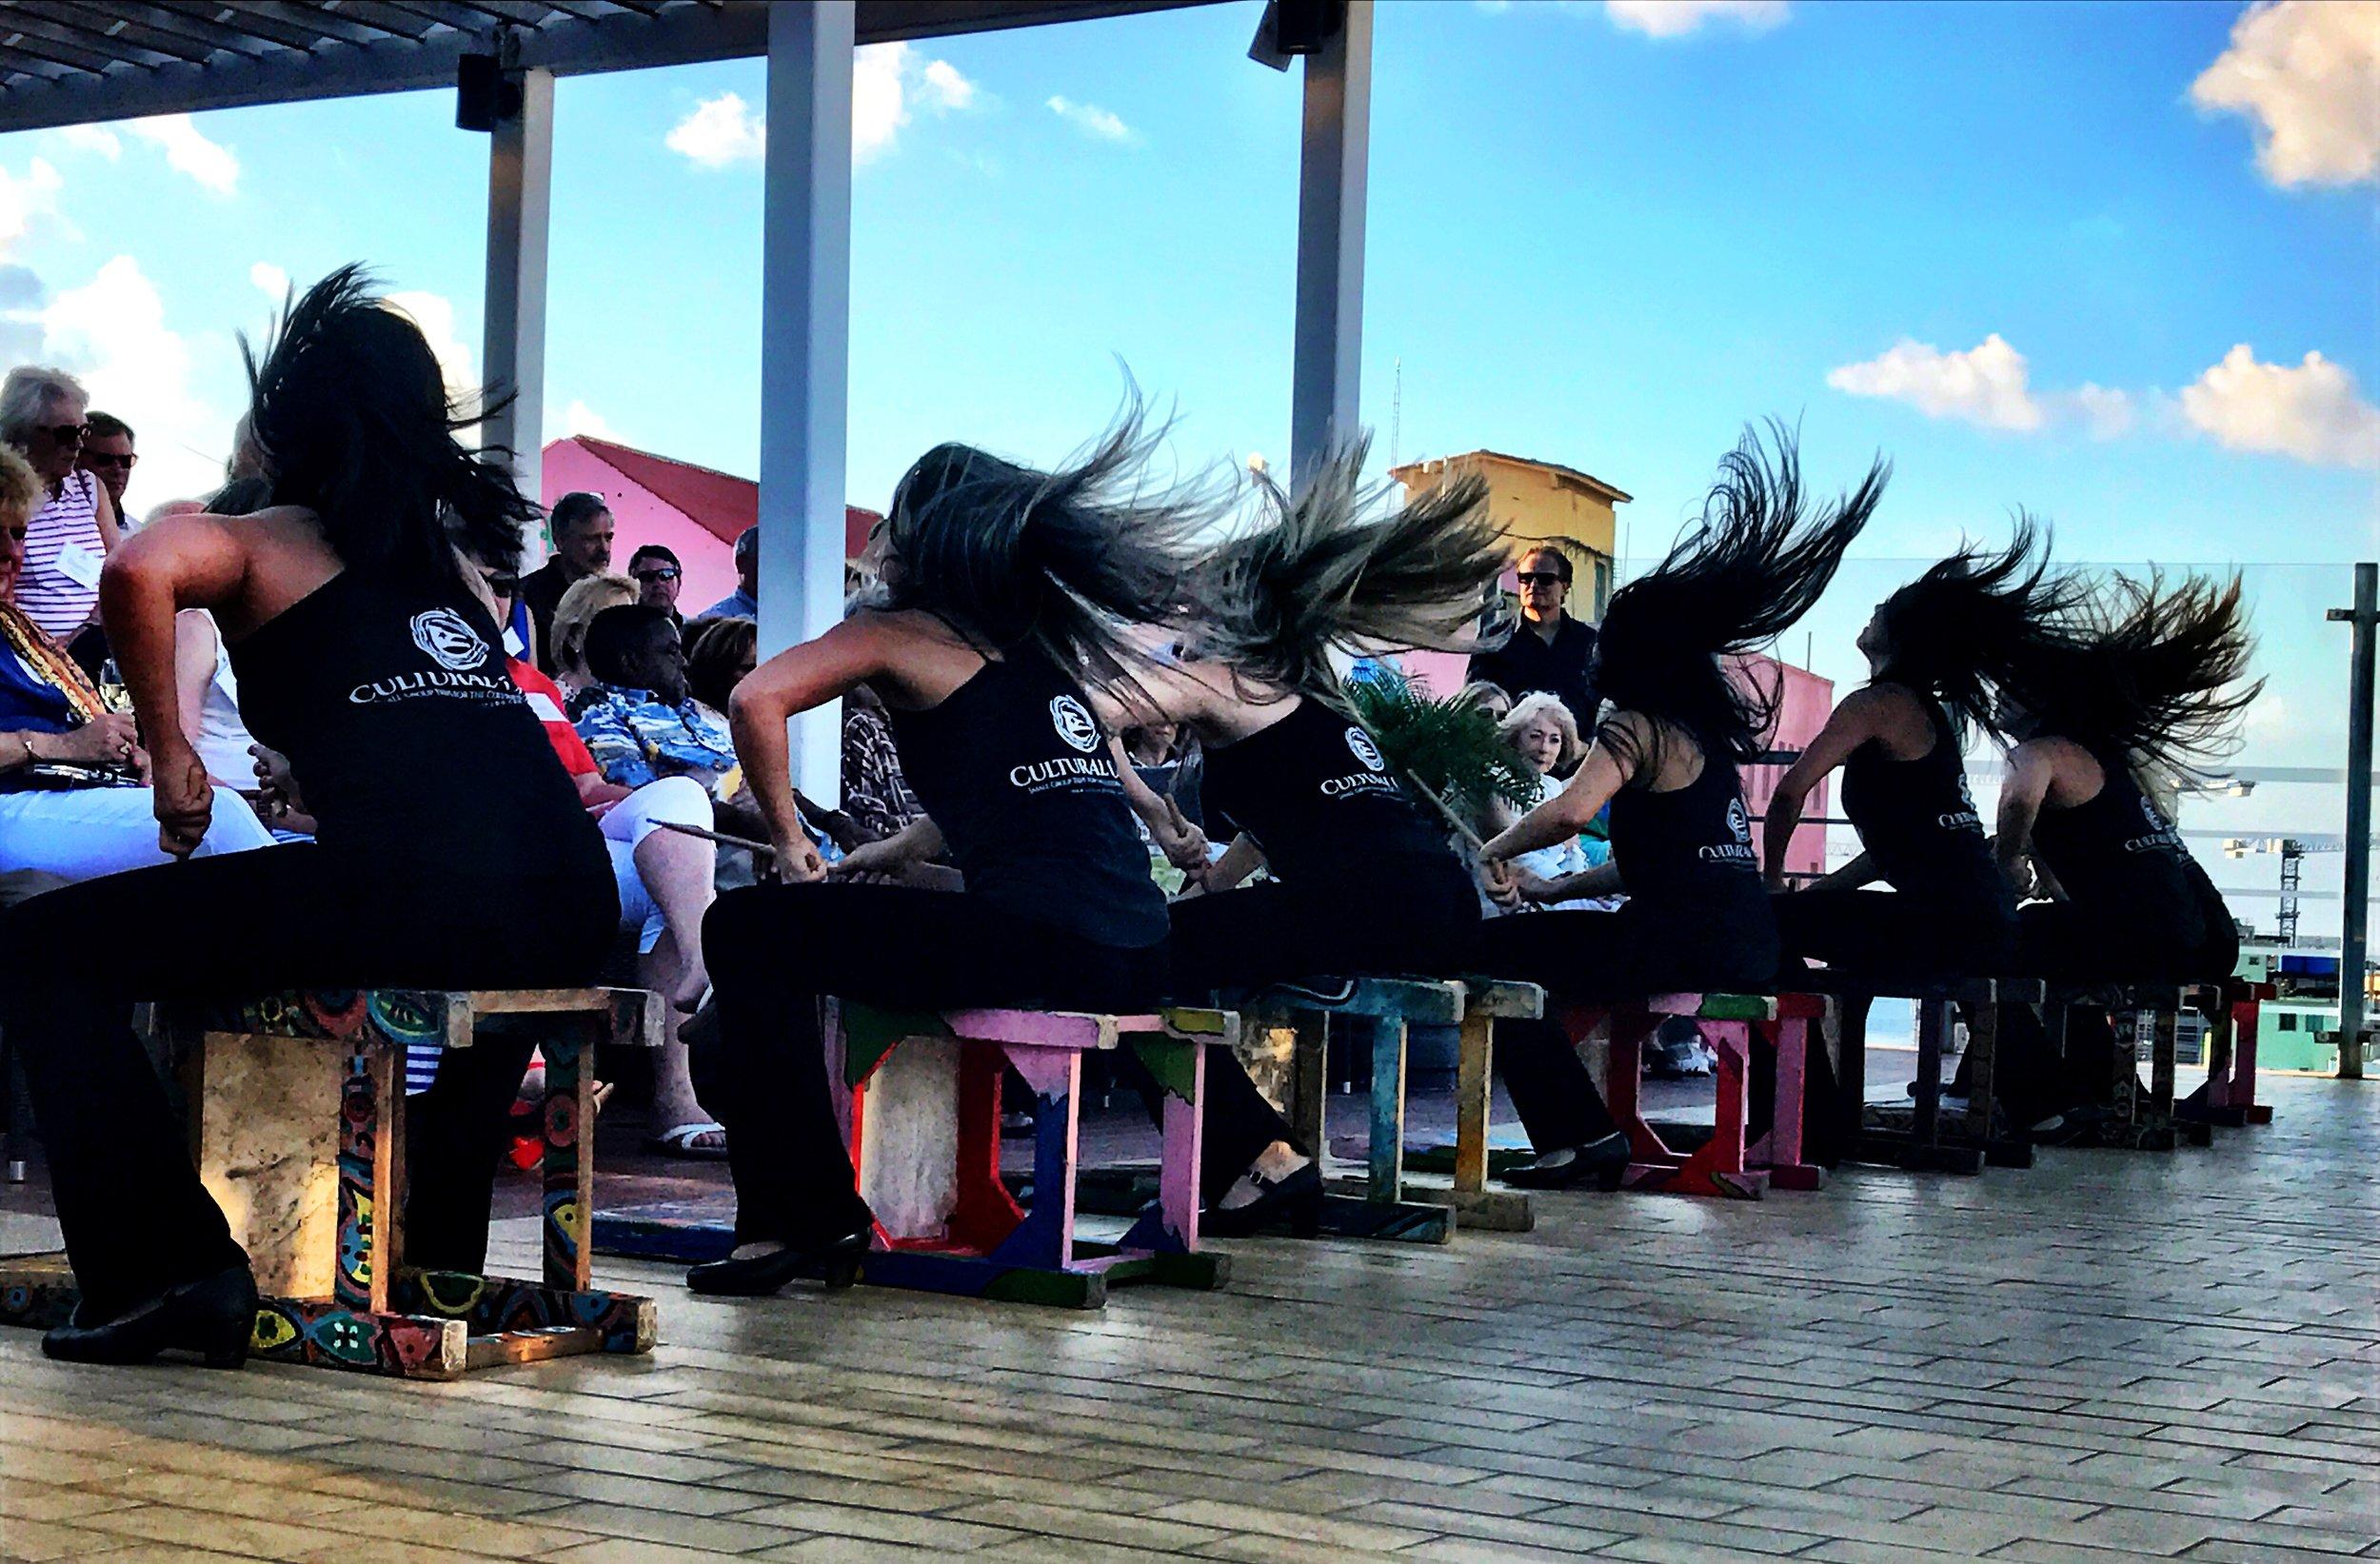 ¡Viva Cuba! - 7 DAYS OF EPIC EXPERIENCESyoga | art | music | culture